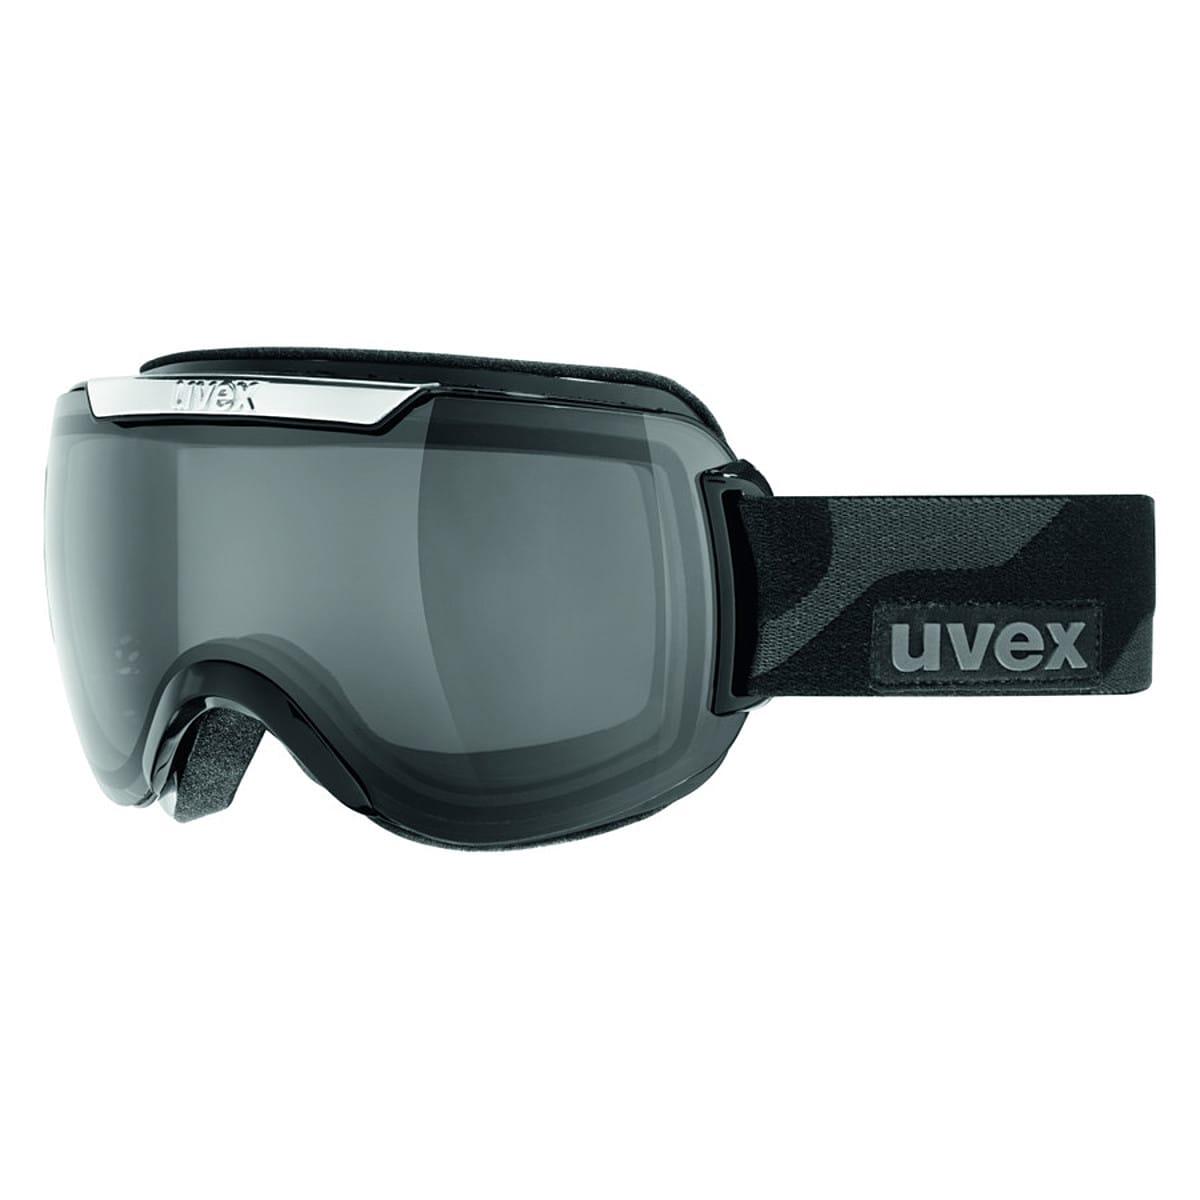 photo: Uvex Downhill 2000 Variomatic Polavision Goggle